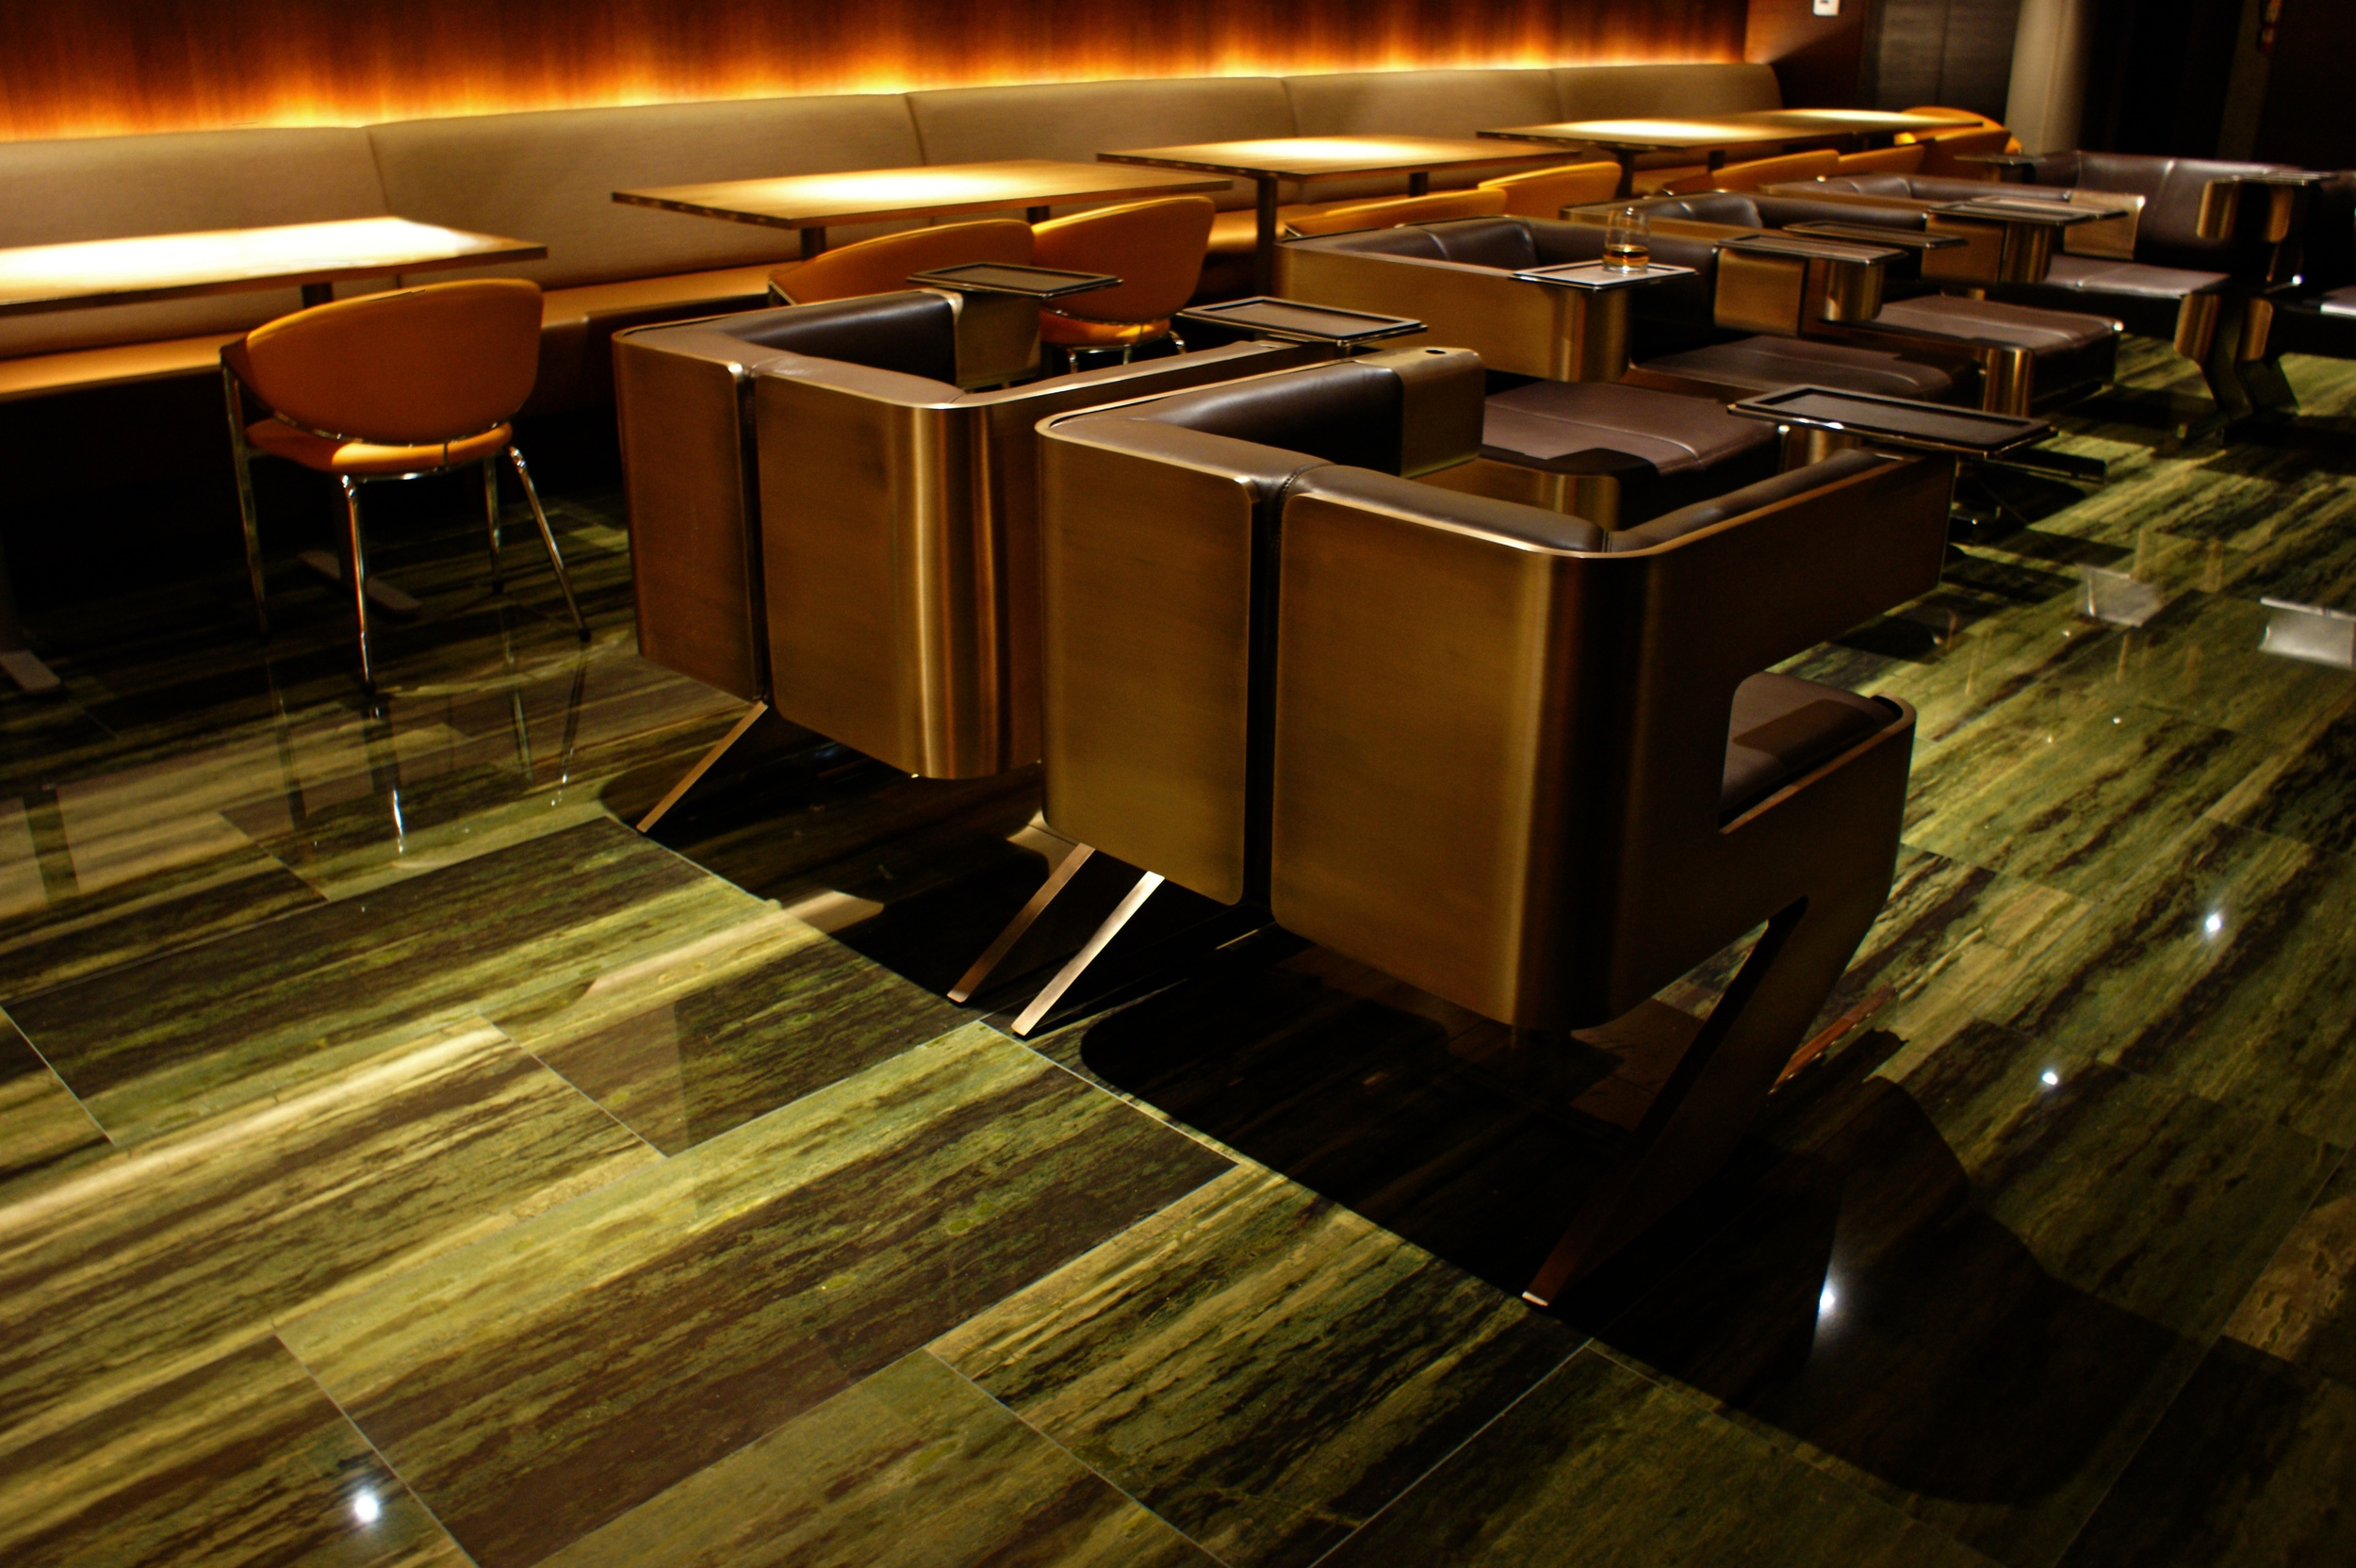 tasting chairs.jpg